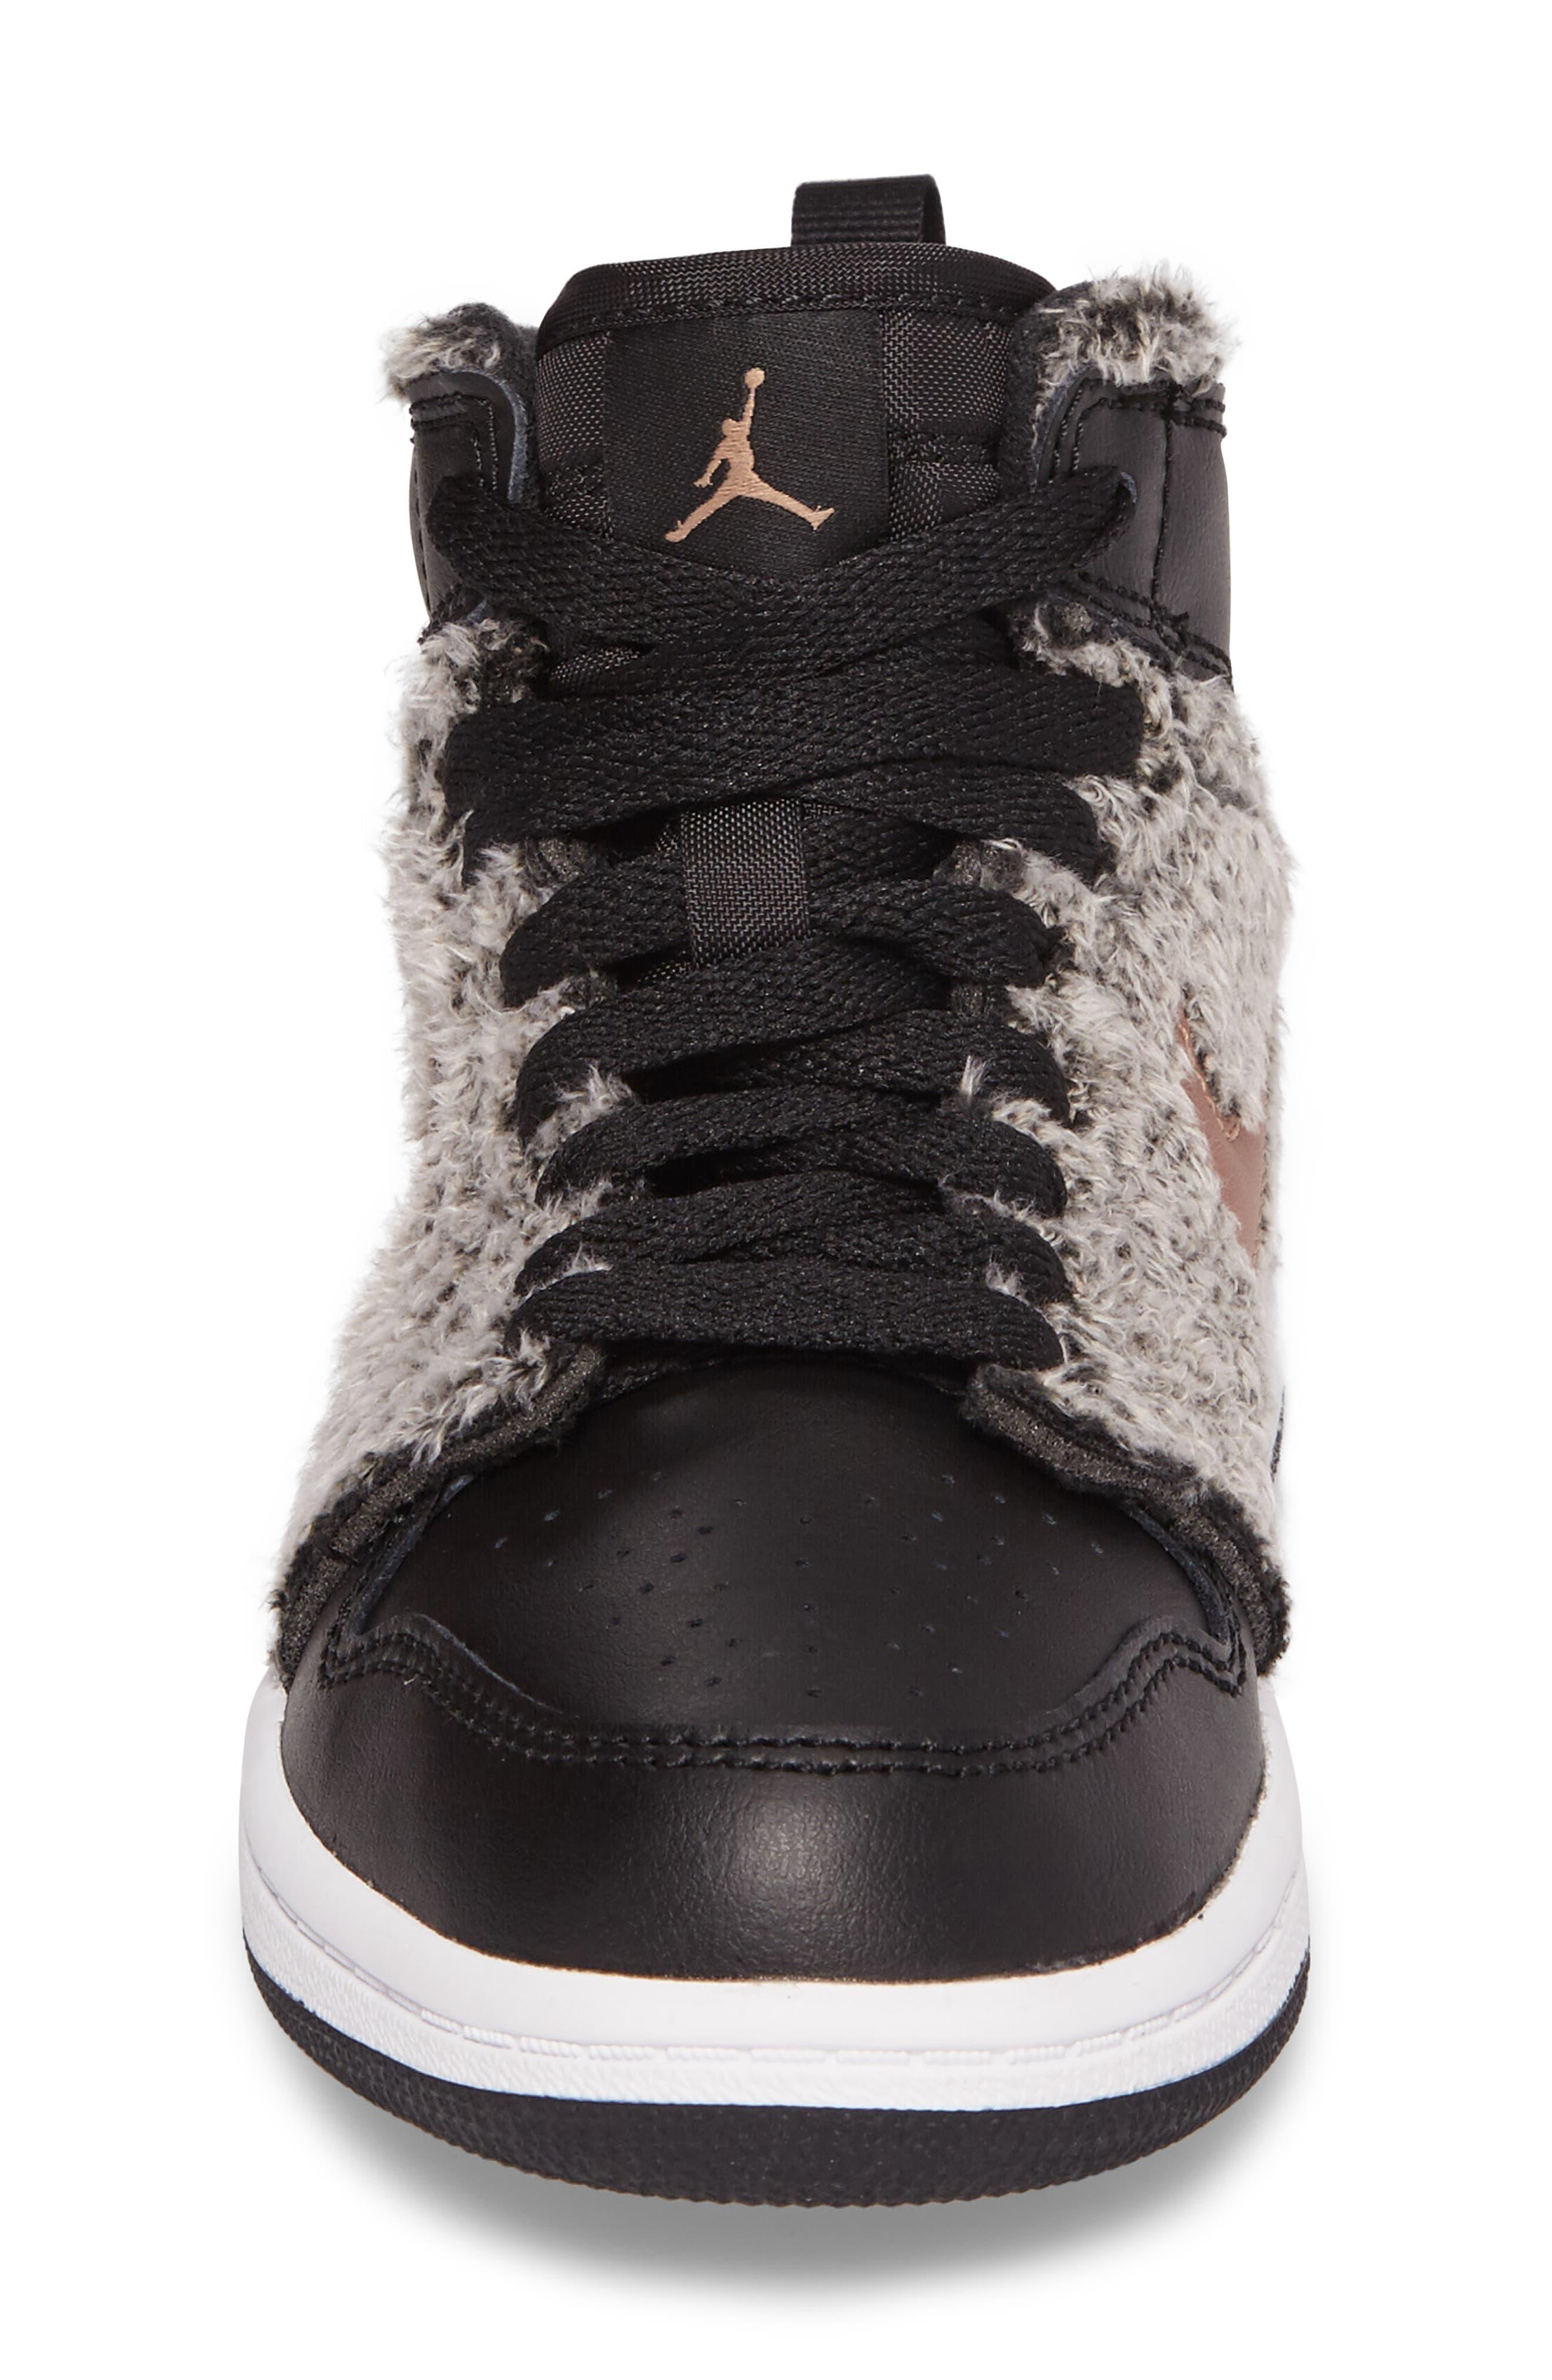 Alternate Image 4  - Nike Air Jordan 1 Retro Faux Fur High Top Sneaker (Toddler, Little Kid & Big Kid)